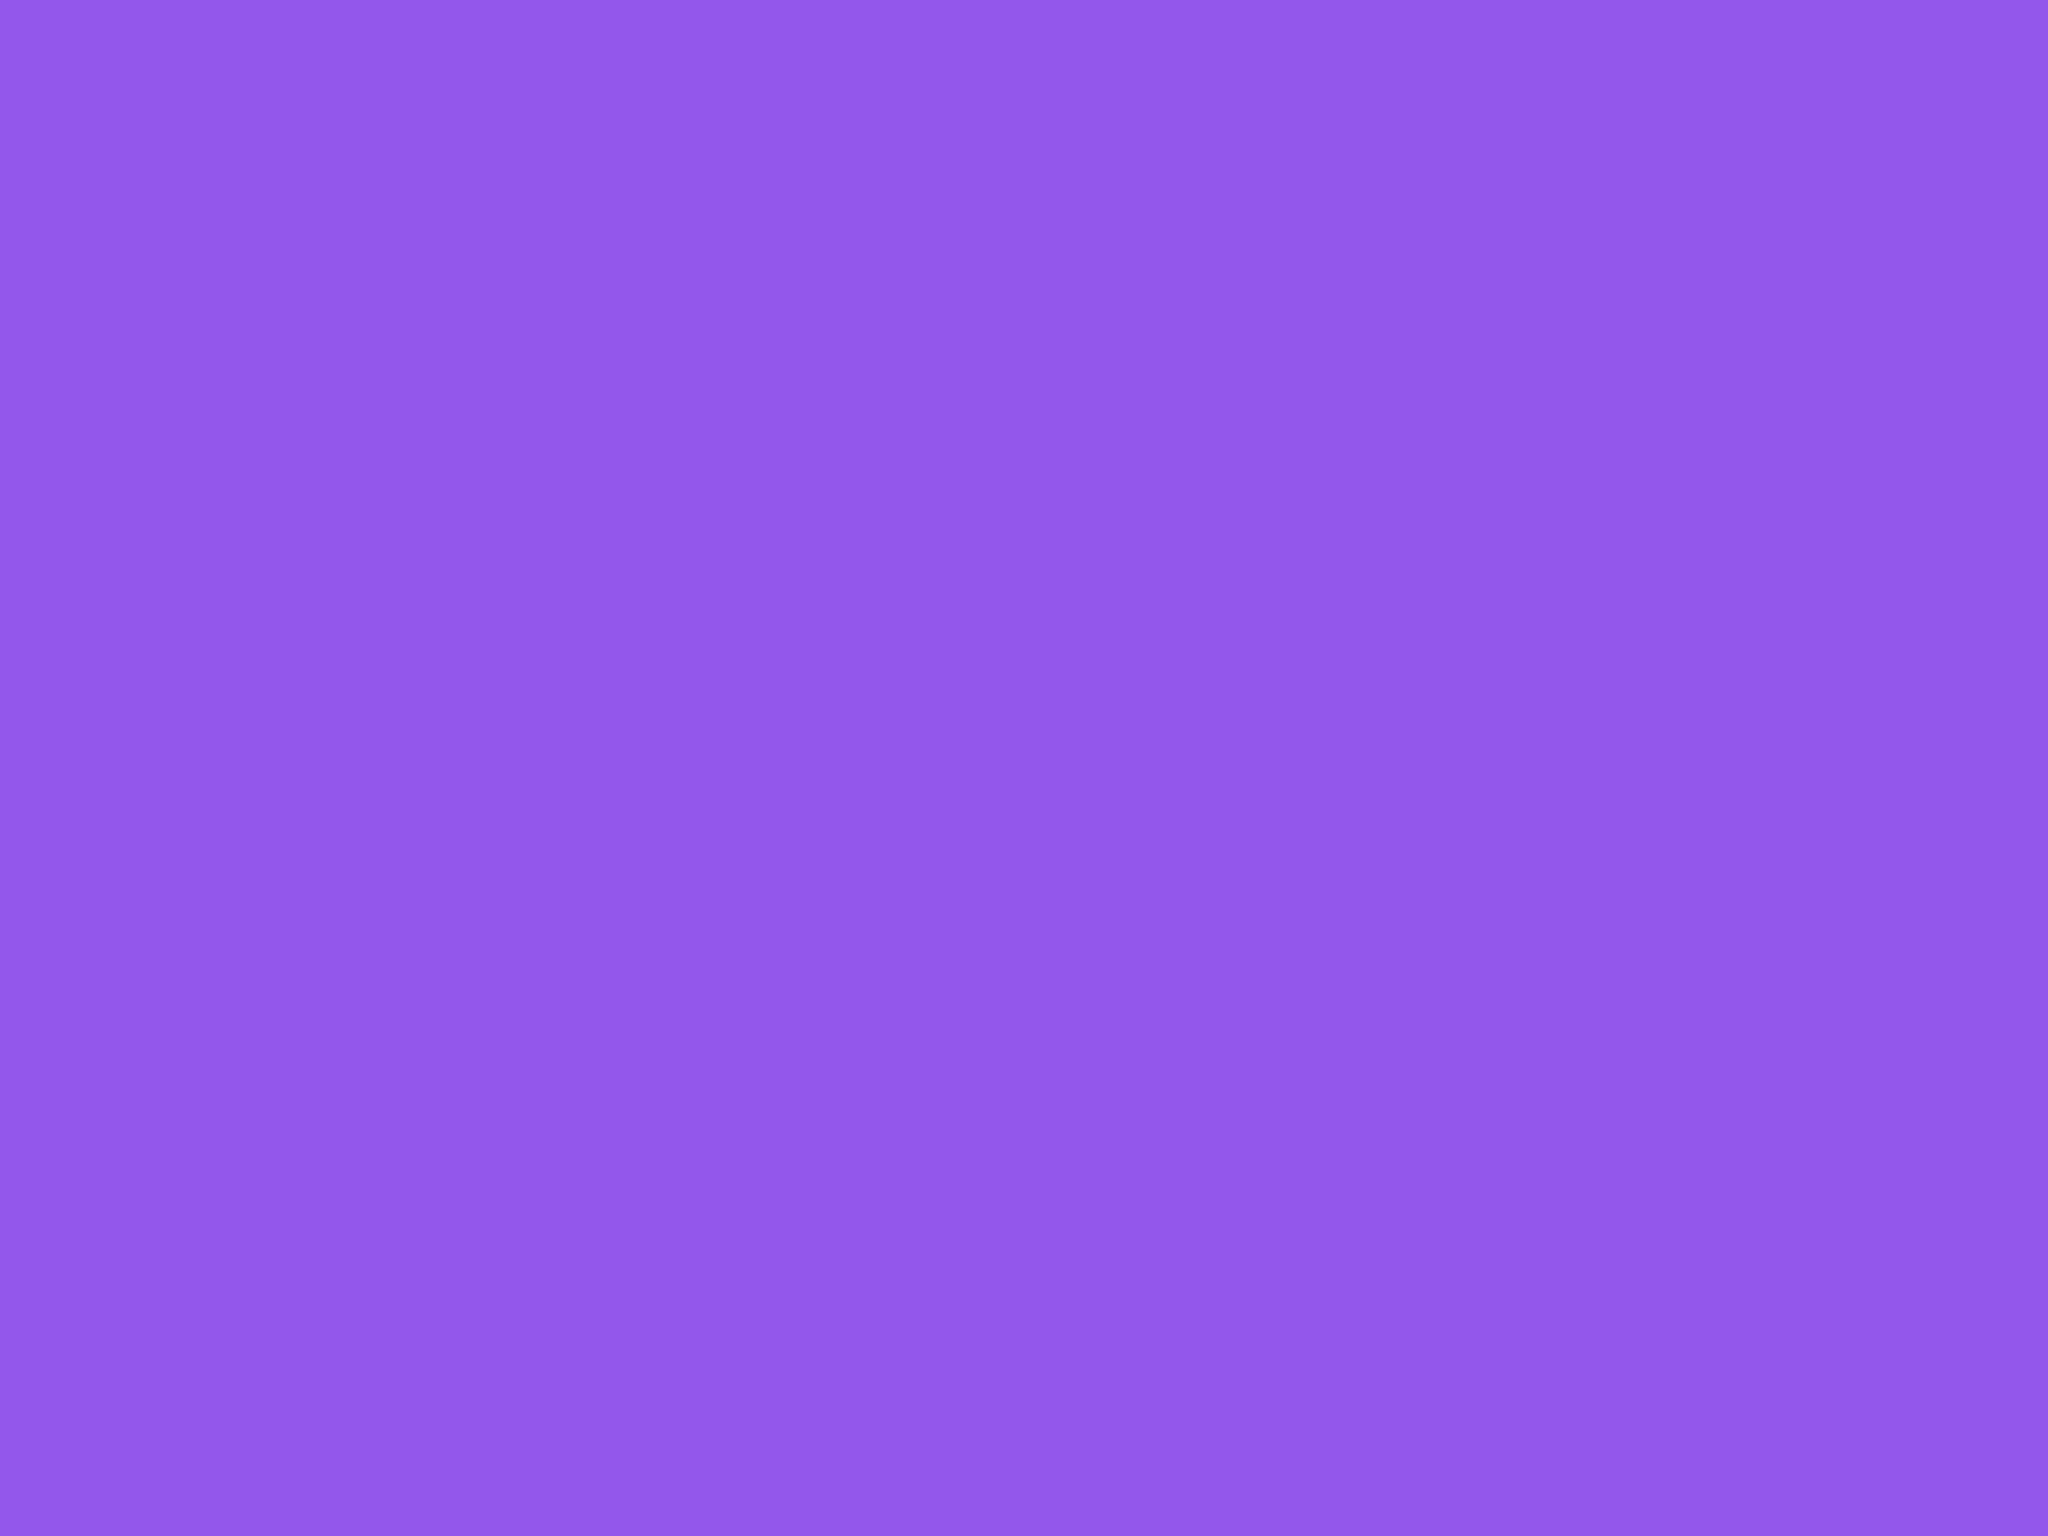 2048x1536 Lavender Indigo Solid Color Background